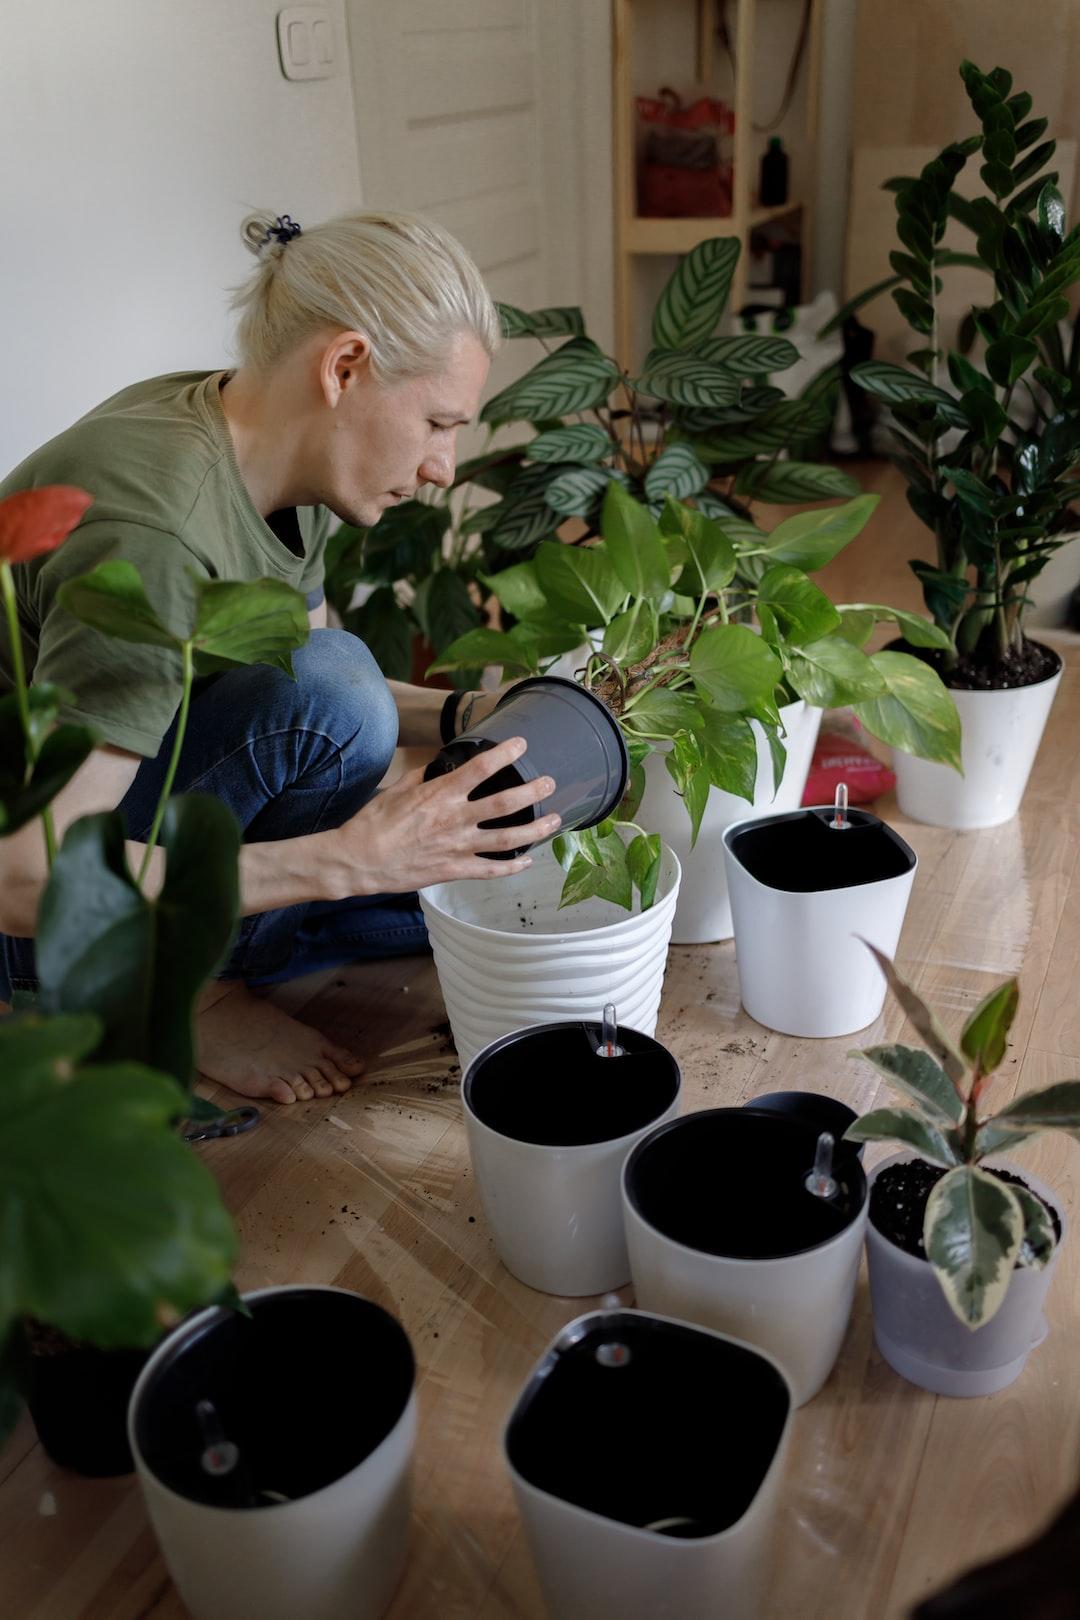 Gardening, planting at home. Man relocating houseplants